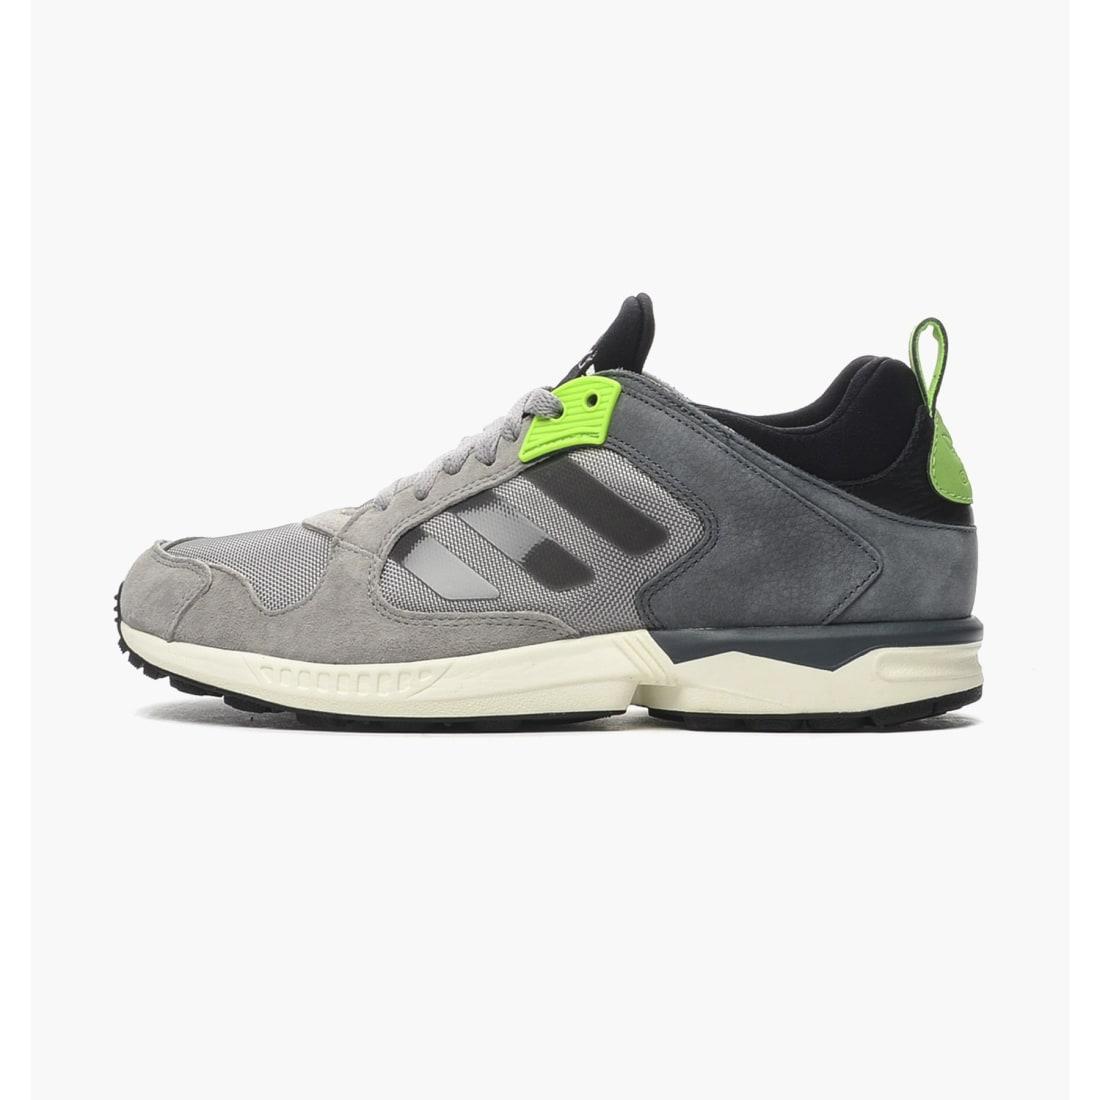 7f2732a05fed4 Adidas · adidas Originals. adidas ZX 5000